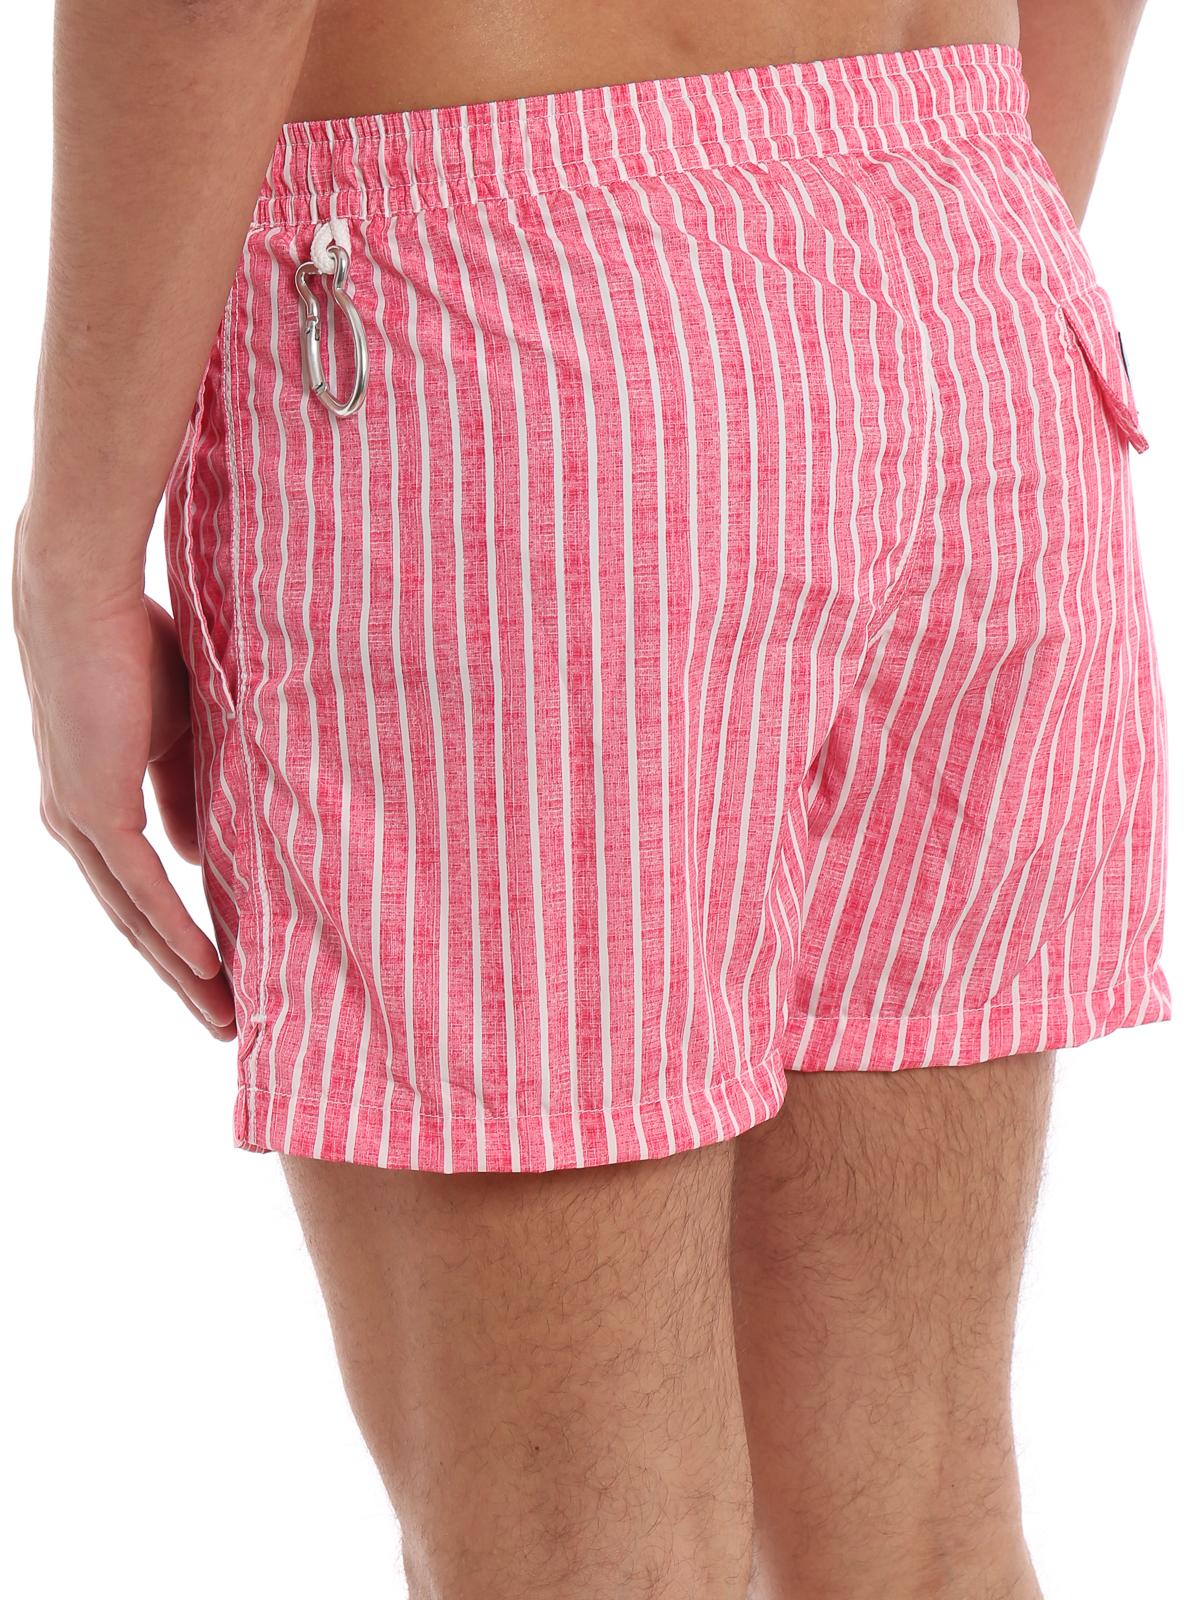 c8a28d6429 Fedeli - Red and white striped swim shorts - Swim shorts & swimming ...